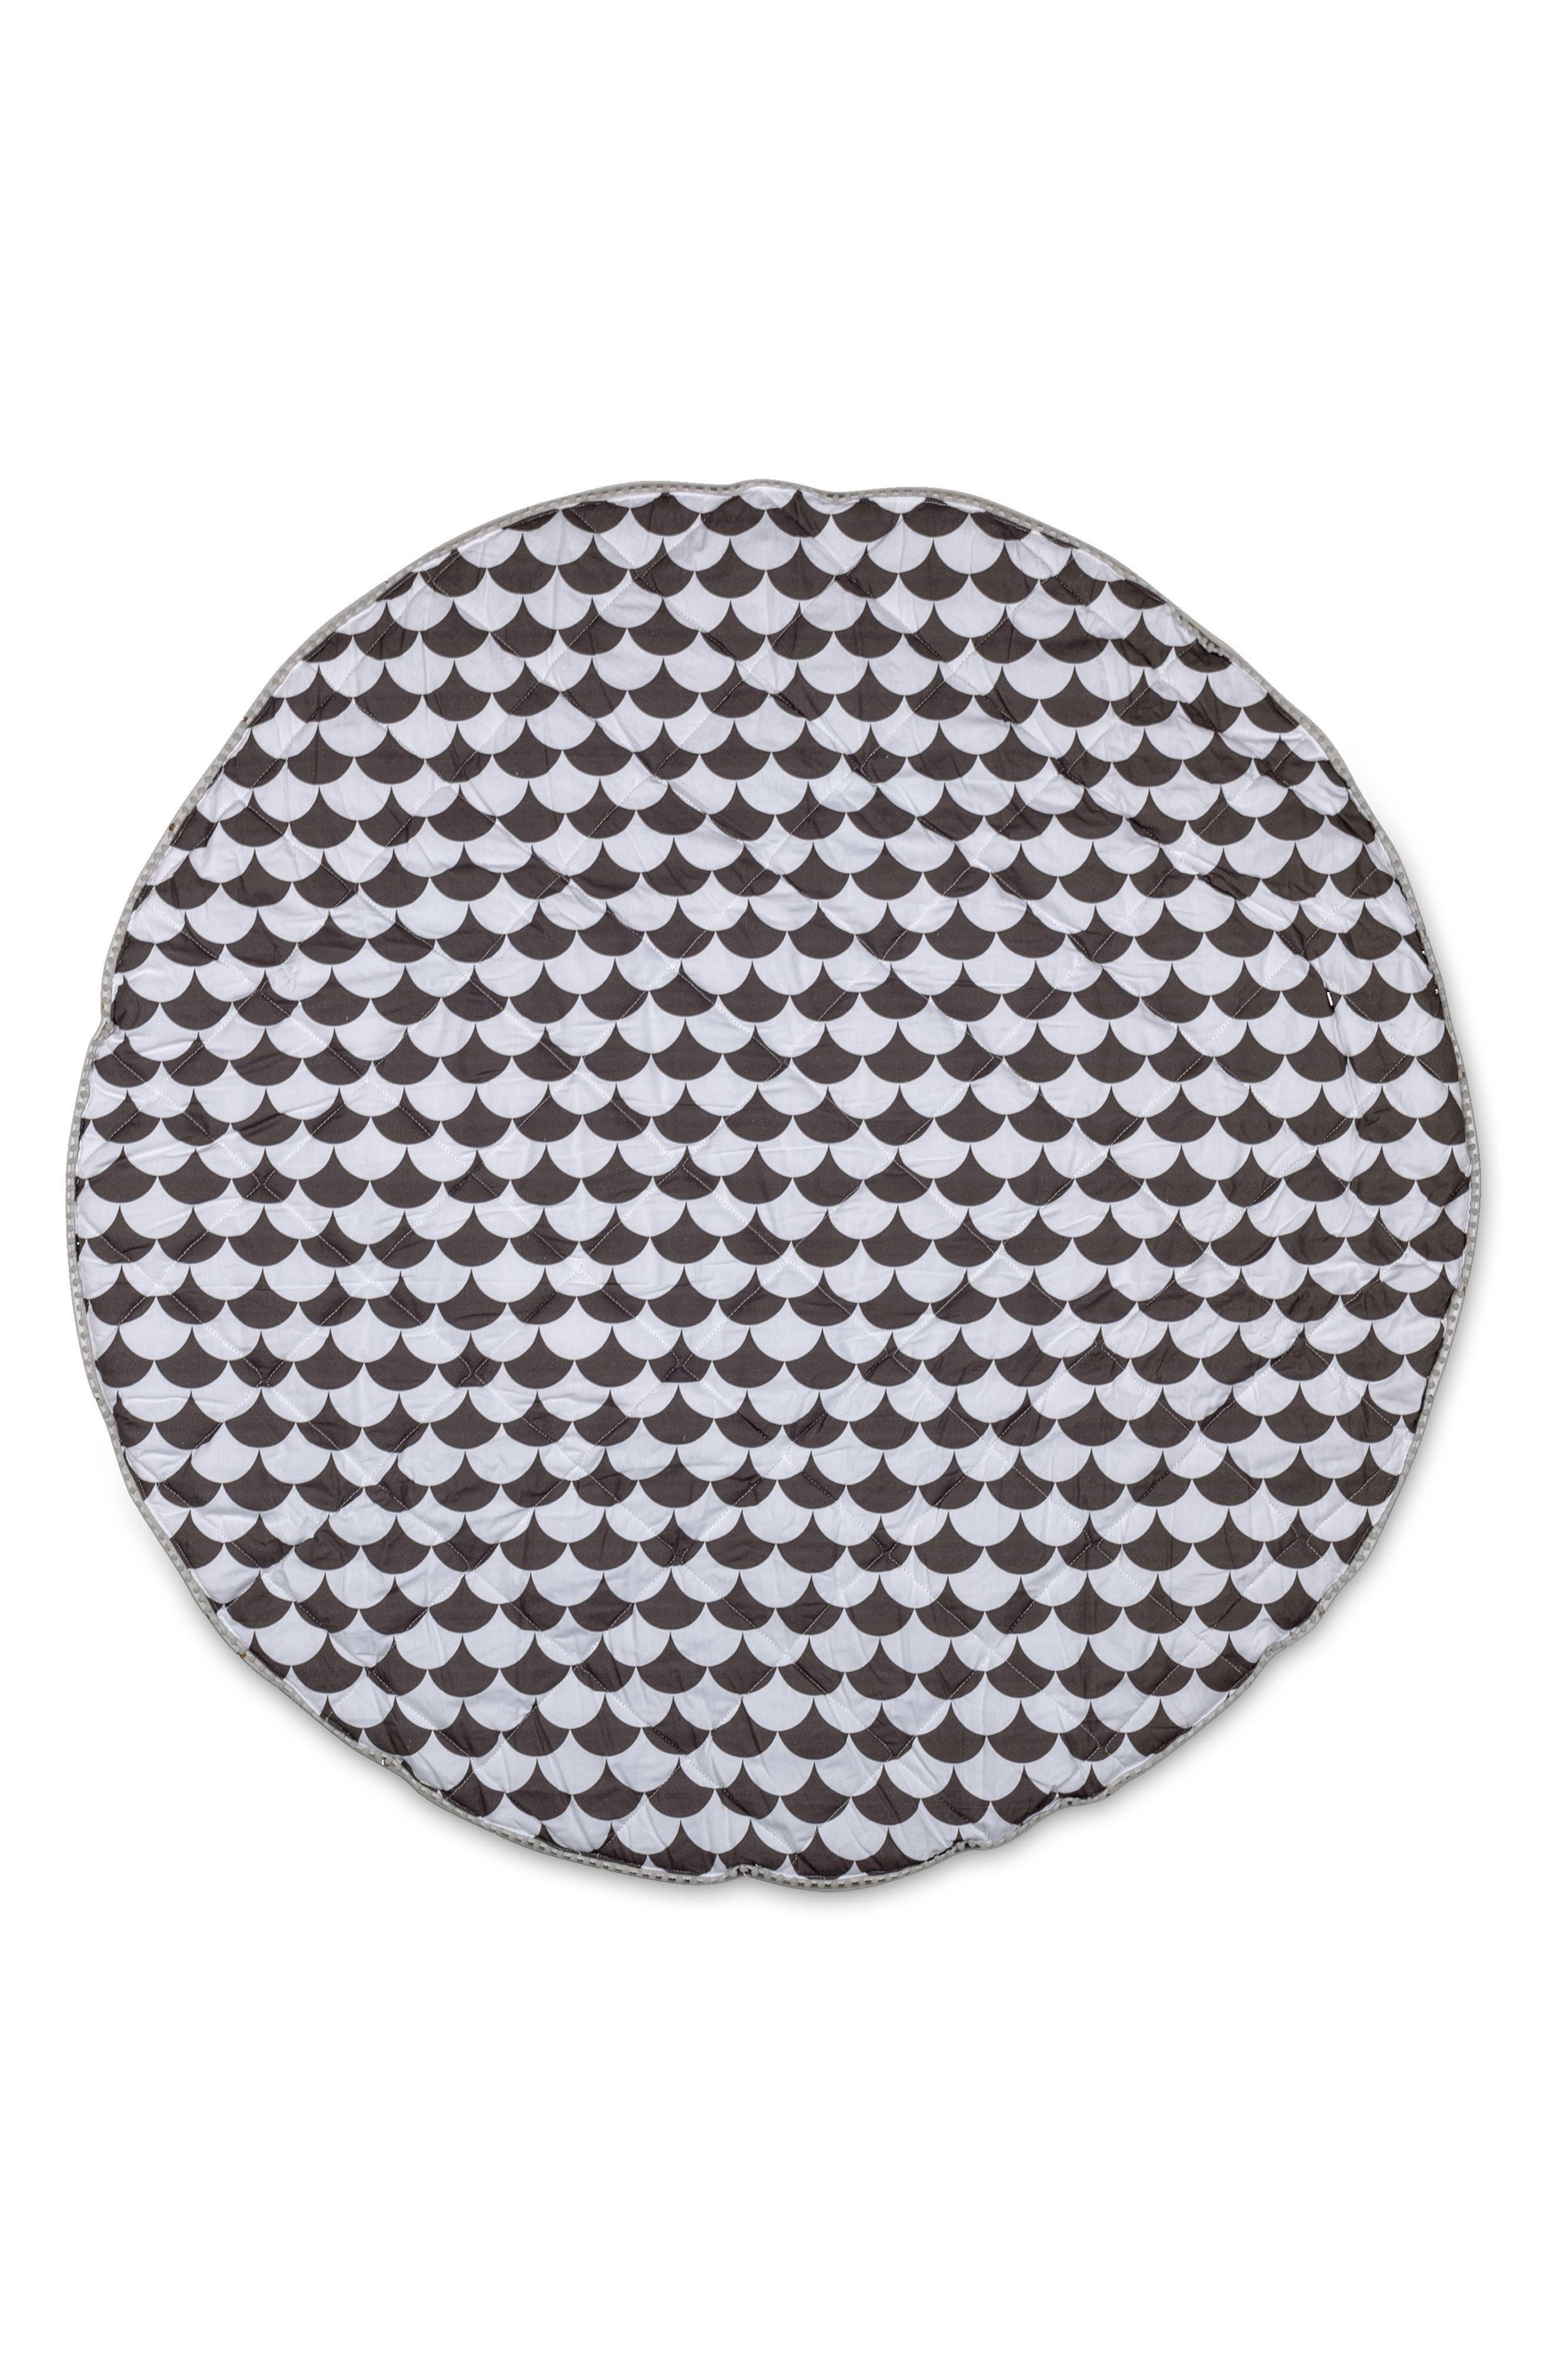 Alternate Image 1 Selected - Living Textiles Kayden Play Mat